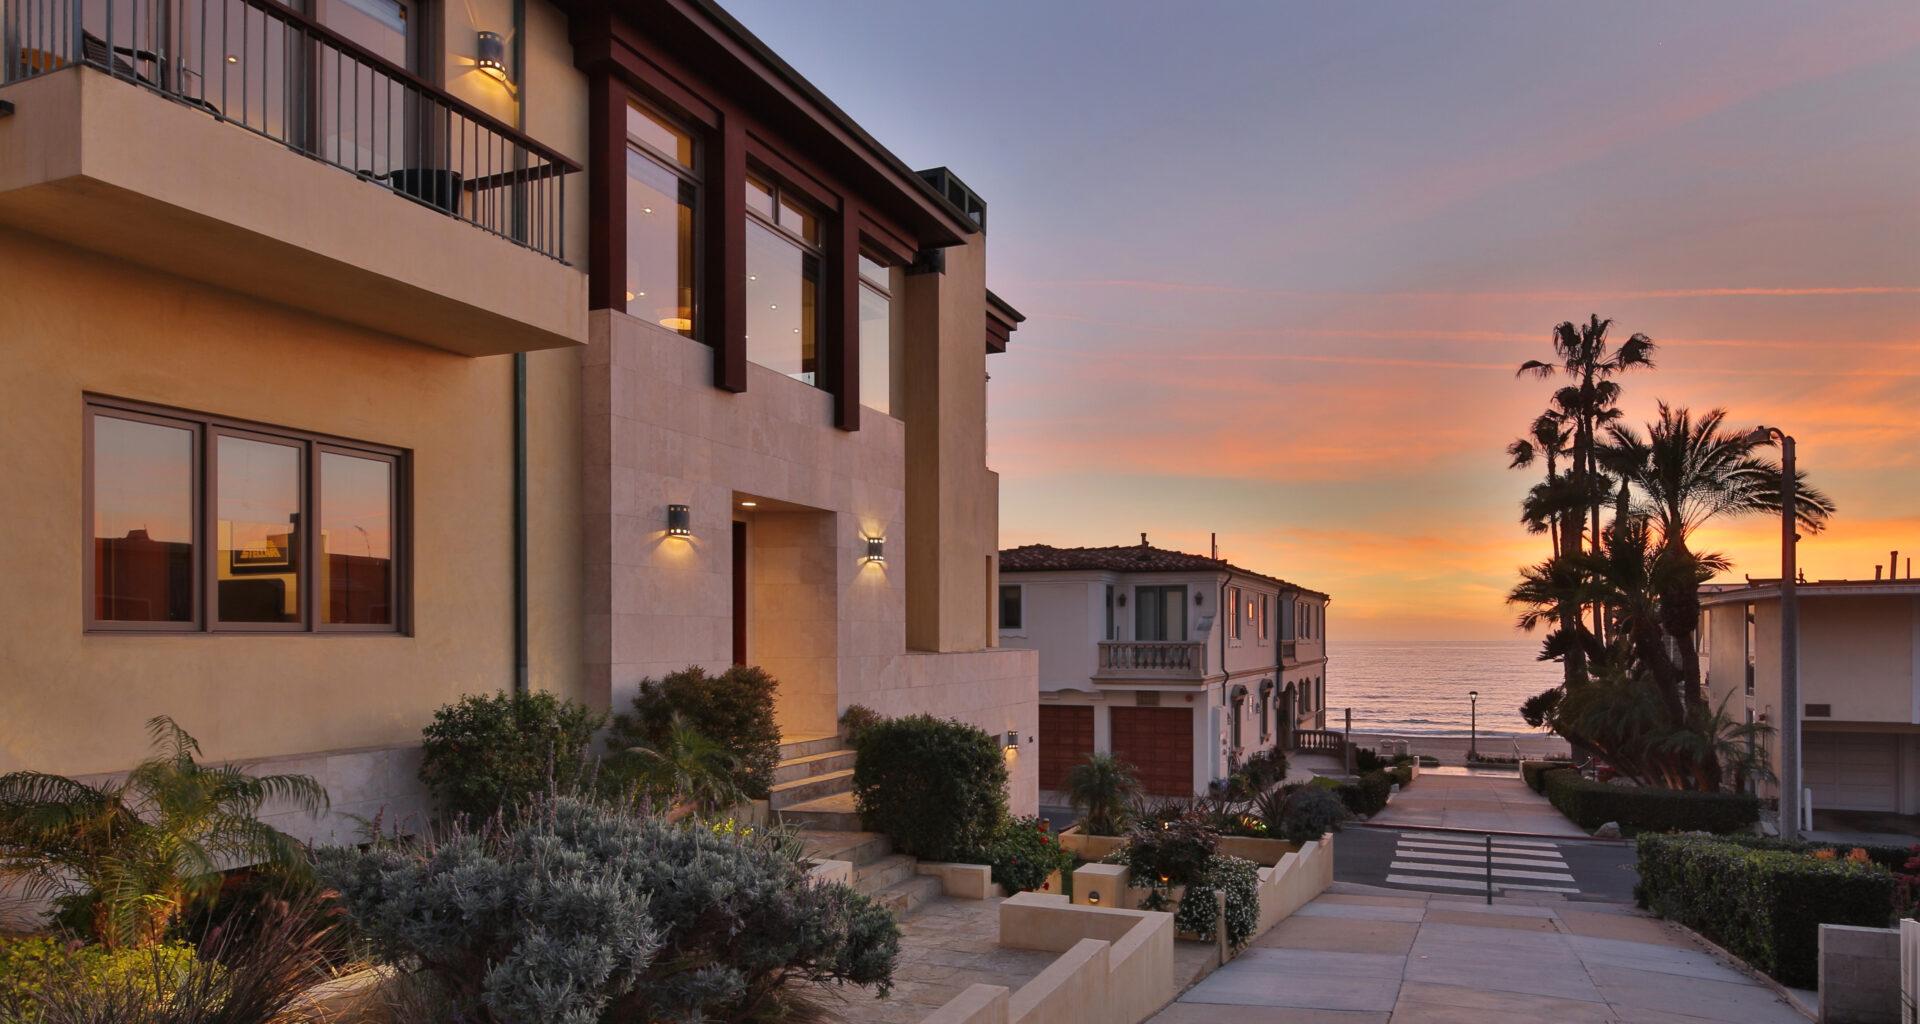 Mike D'Antoni, Los Angeles Lakers, Manhattan Beach, Kaminsky Real Estate Group, Ed Kaminsky, SportStar Relocation,